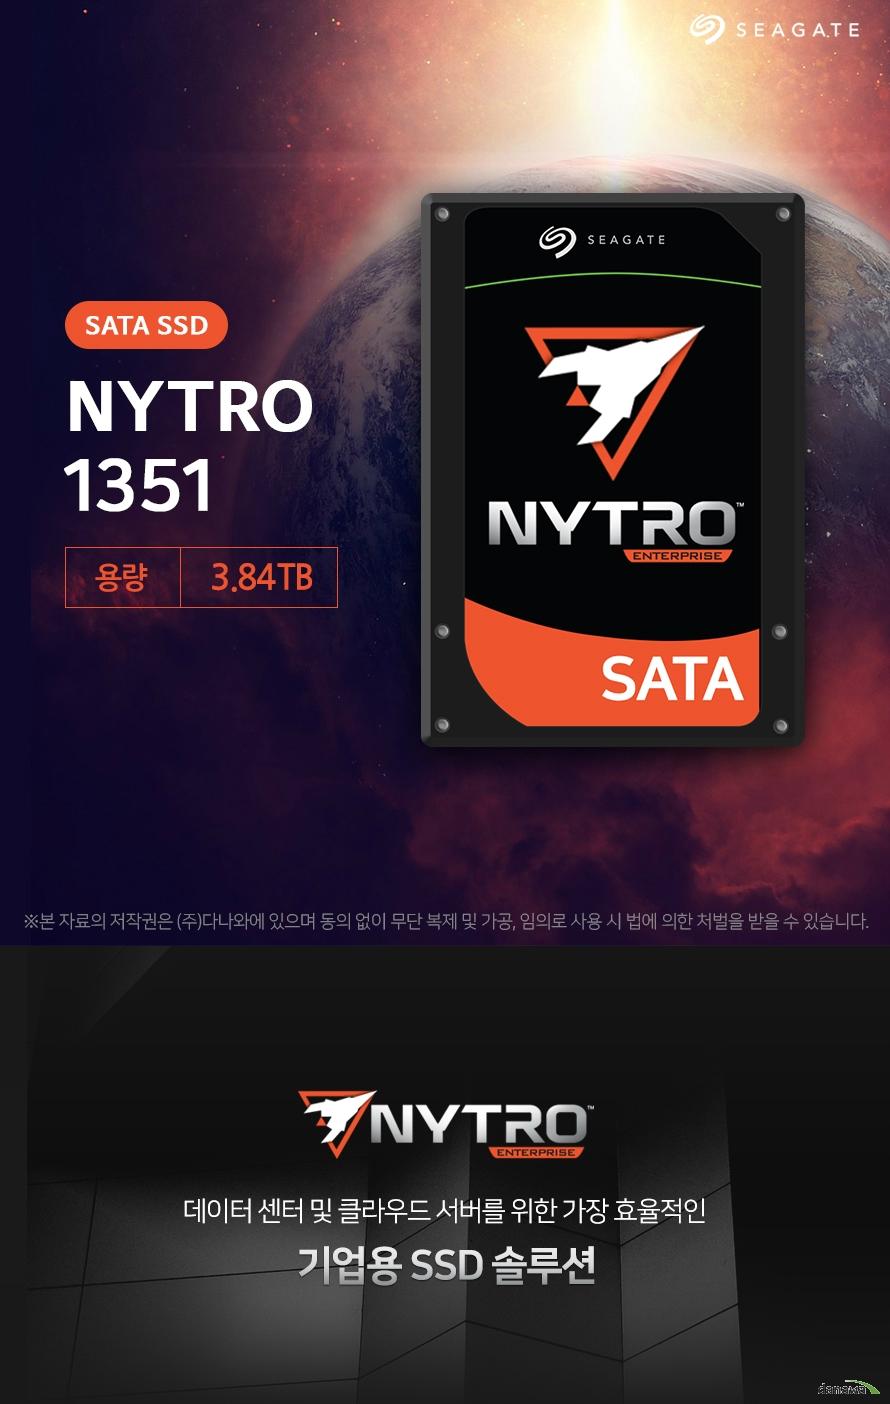 seagate 니트로 SSD 3.84TB  데이터 센터 및 클라우드 서버를 위한 가장 효율적인 기업용 SSD 솔루션  seagate의 특별한 기술로 완성된 고성능 SSD  니트로 SSD시리즈에 들어간 Durawrite기술로 기업에서 필요로하는 고성능, 고용량의  효율적인 SSD를 탄생시켰습니다. 타사 대비 더욱 강력한 퍼포먼스를 가진SSD로 사용자의 환경을 쾌적하게 만들어 드립니다.   seagate secure를 통한 강력한 데이터 보호 예상하지 못한 정전발생 등의 갑작스러운 사건이 일어나더라도 철저하게 데이터를 보호할 수 있는 능력을 가진 SSD로서 더욱 안정감 있는 사용자 환경을 제공해 드립니다.  엔터프라이즈급 능력 뛰어난 내구성, 속도감 사용자의 용도에 맞는 환경을 제공하기 위해 더욱 수준높은 능력을 갖췄습니다. 지속적인 성능을 위해 내구성을 높이고 읽기 집약적인 작업에도 빠른 속도를 경험 할 수 있도록 해드립니다.